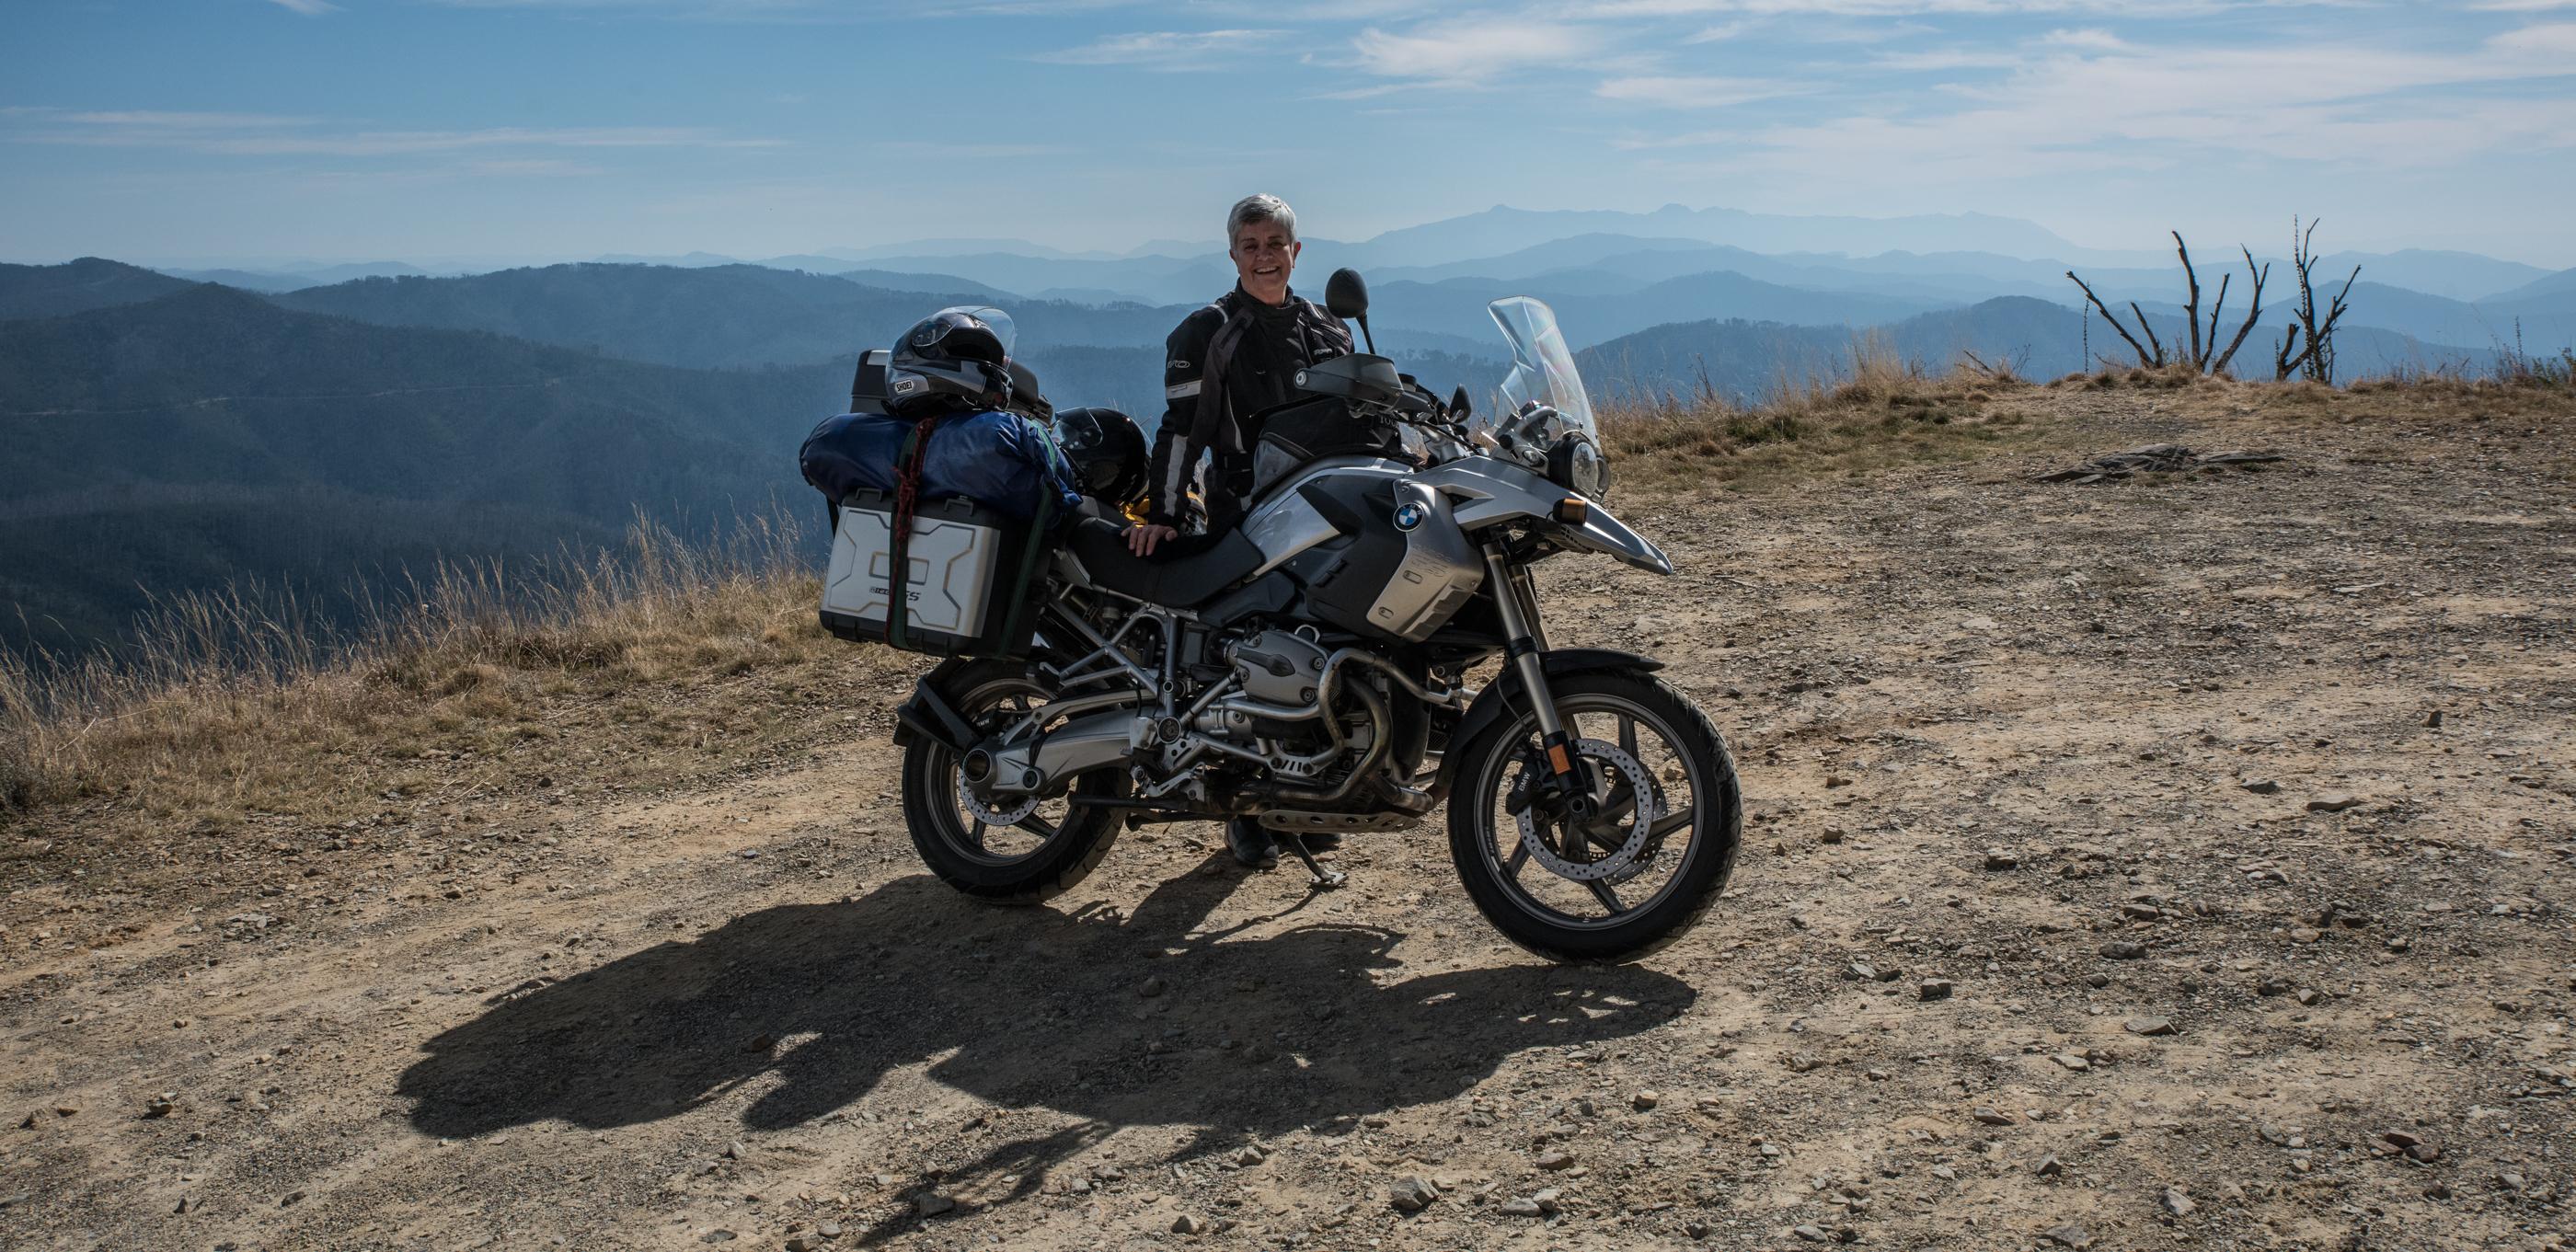 John Langmead_High Country Ride 2018_3580_20180407_Online